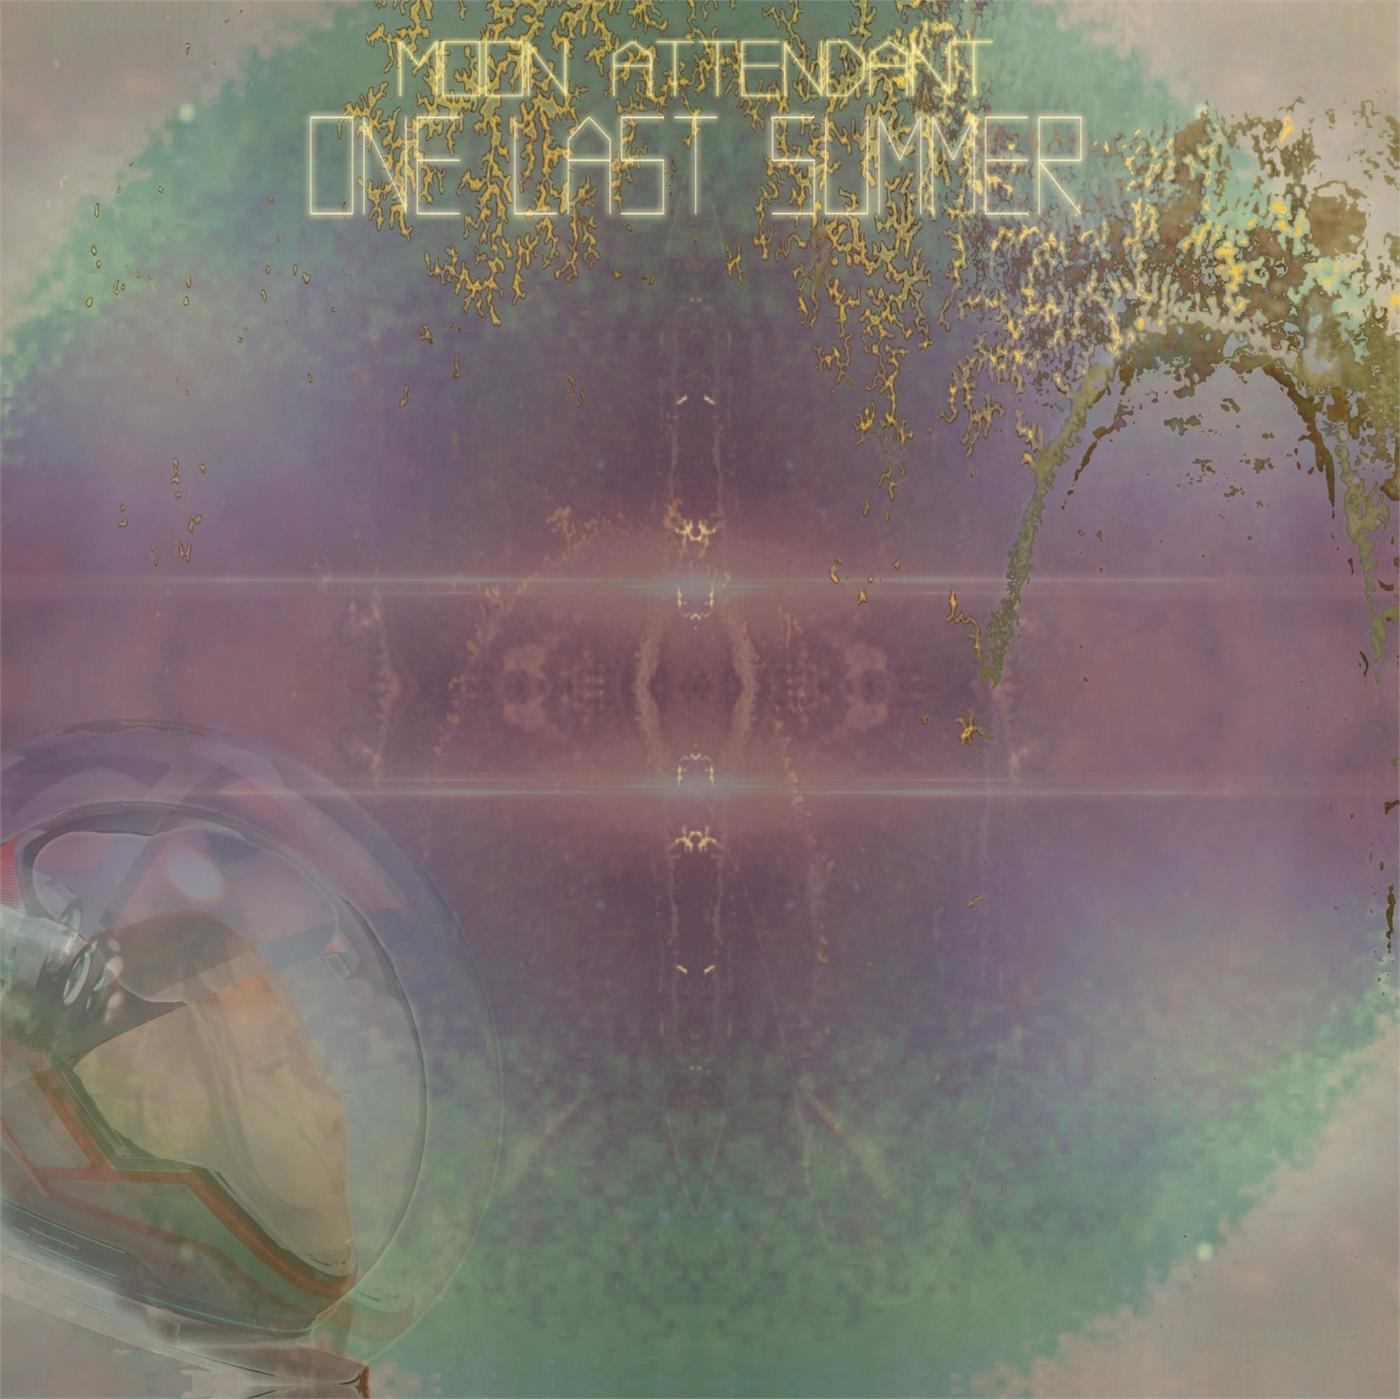 Moon Attendant - One Last Summer [LP]